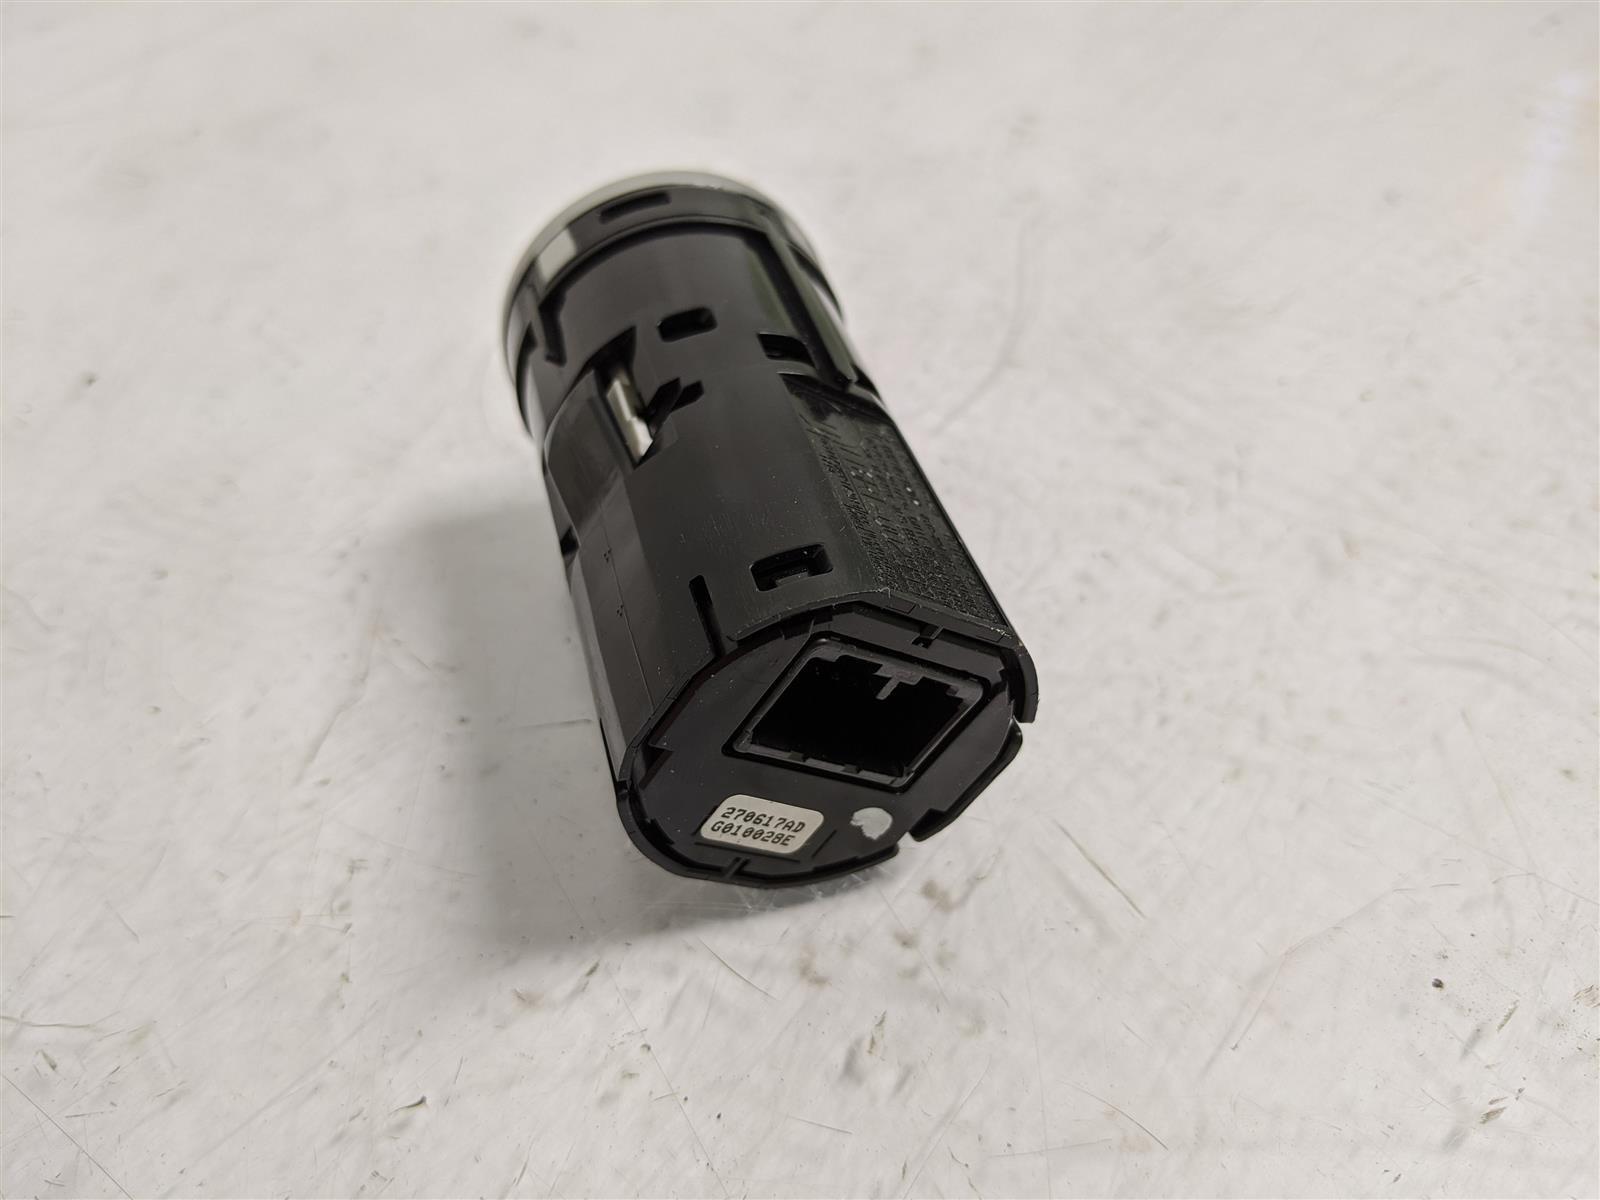 2017 Honda Pilot Push Button Start Replacement